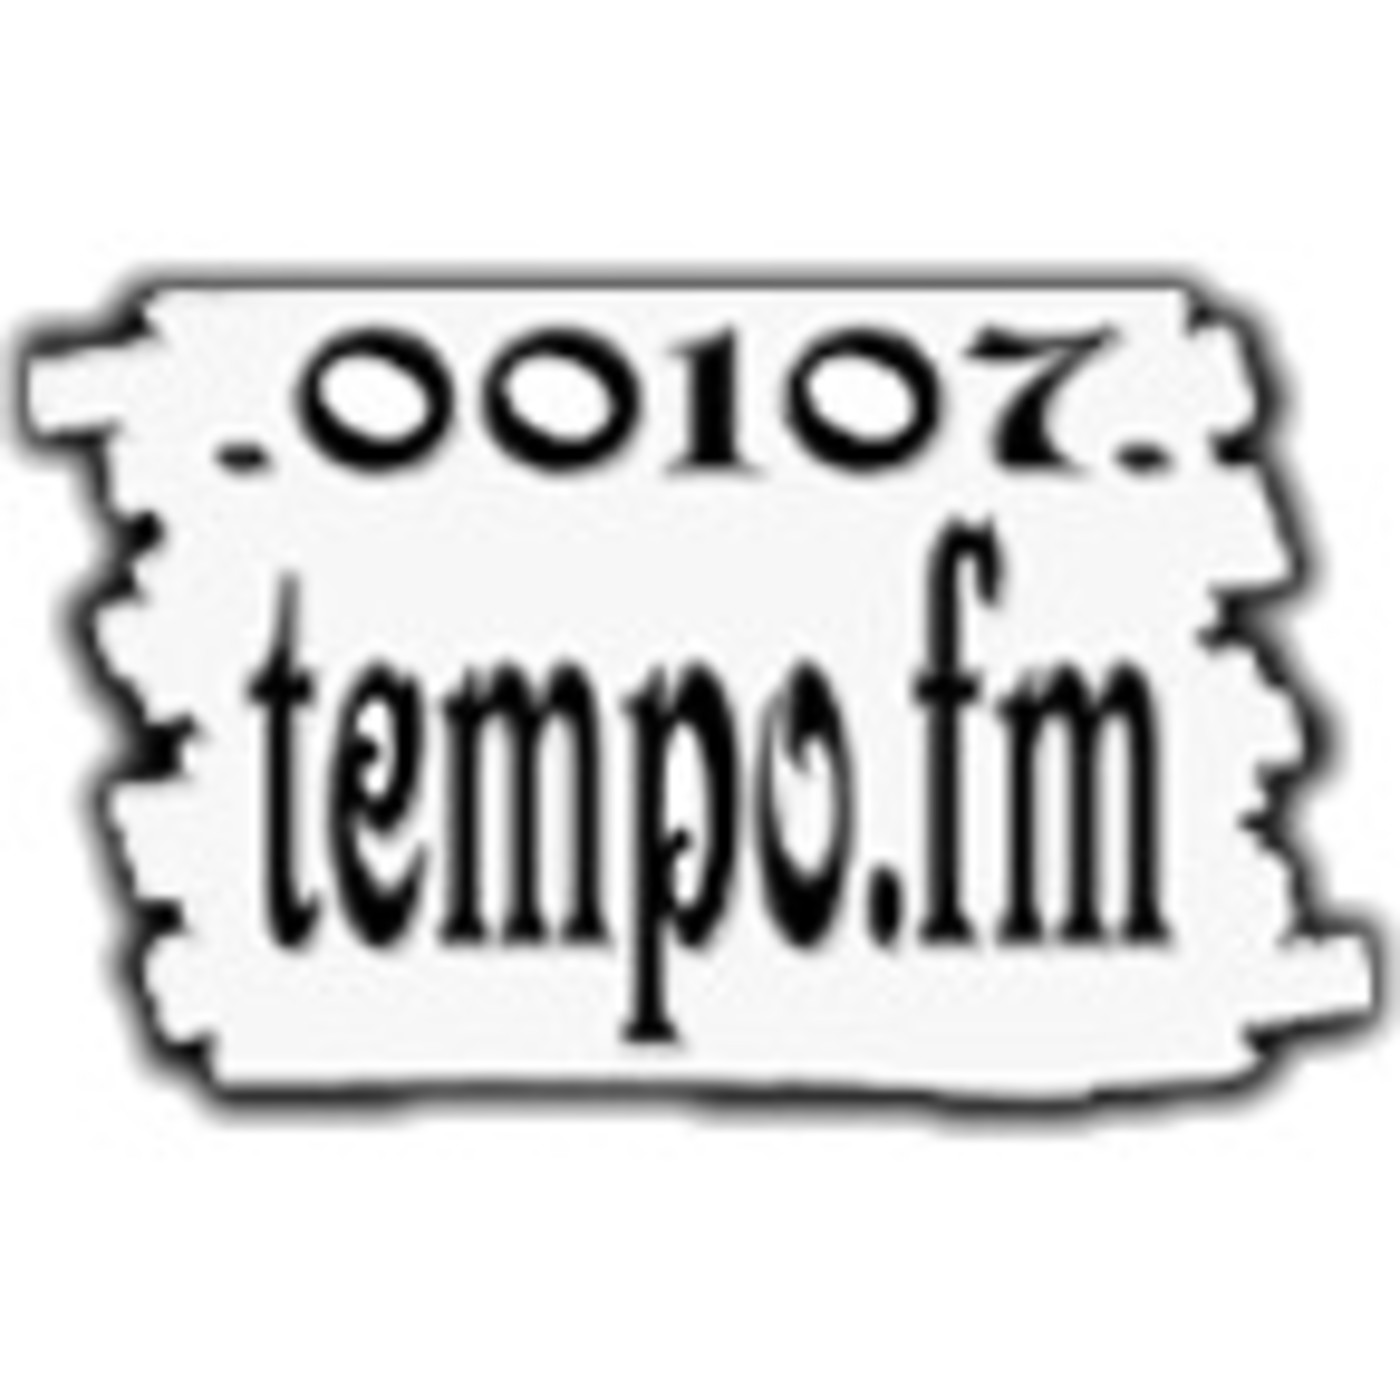 00107 Tempo FM CH 3 The Hottest Vinyl